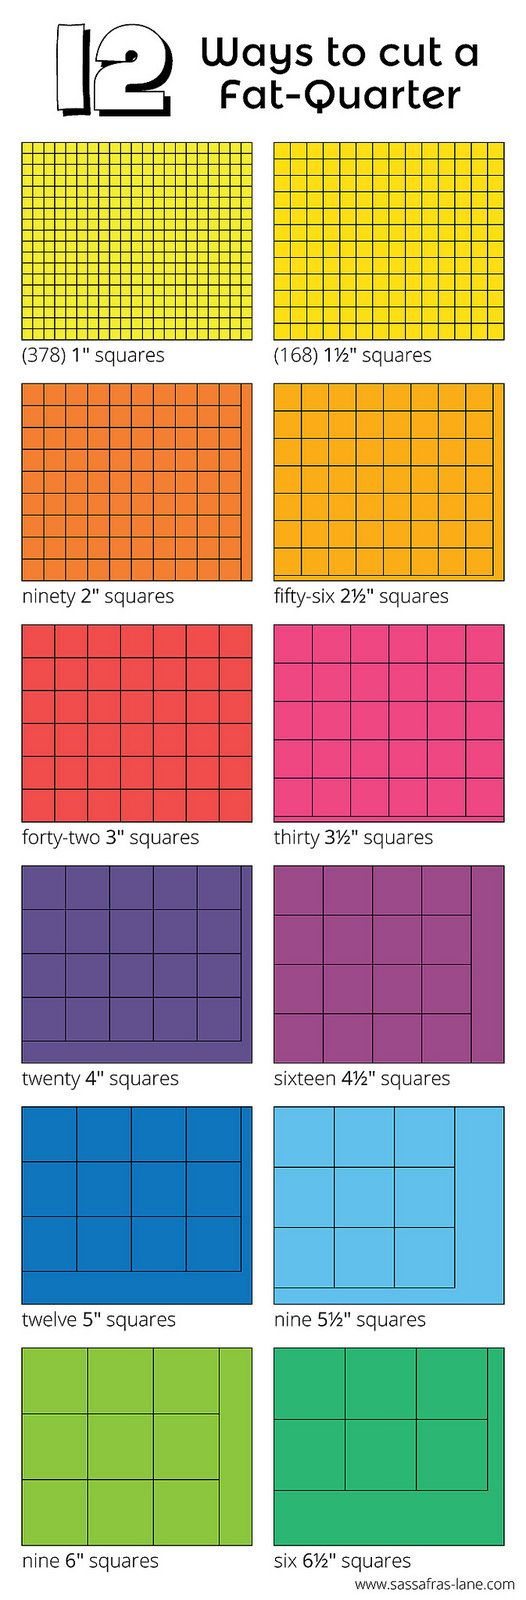 12 Different Ways to cut a Fat-Quarter | by Sassafras Lane Designs